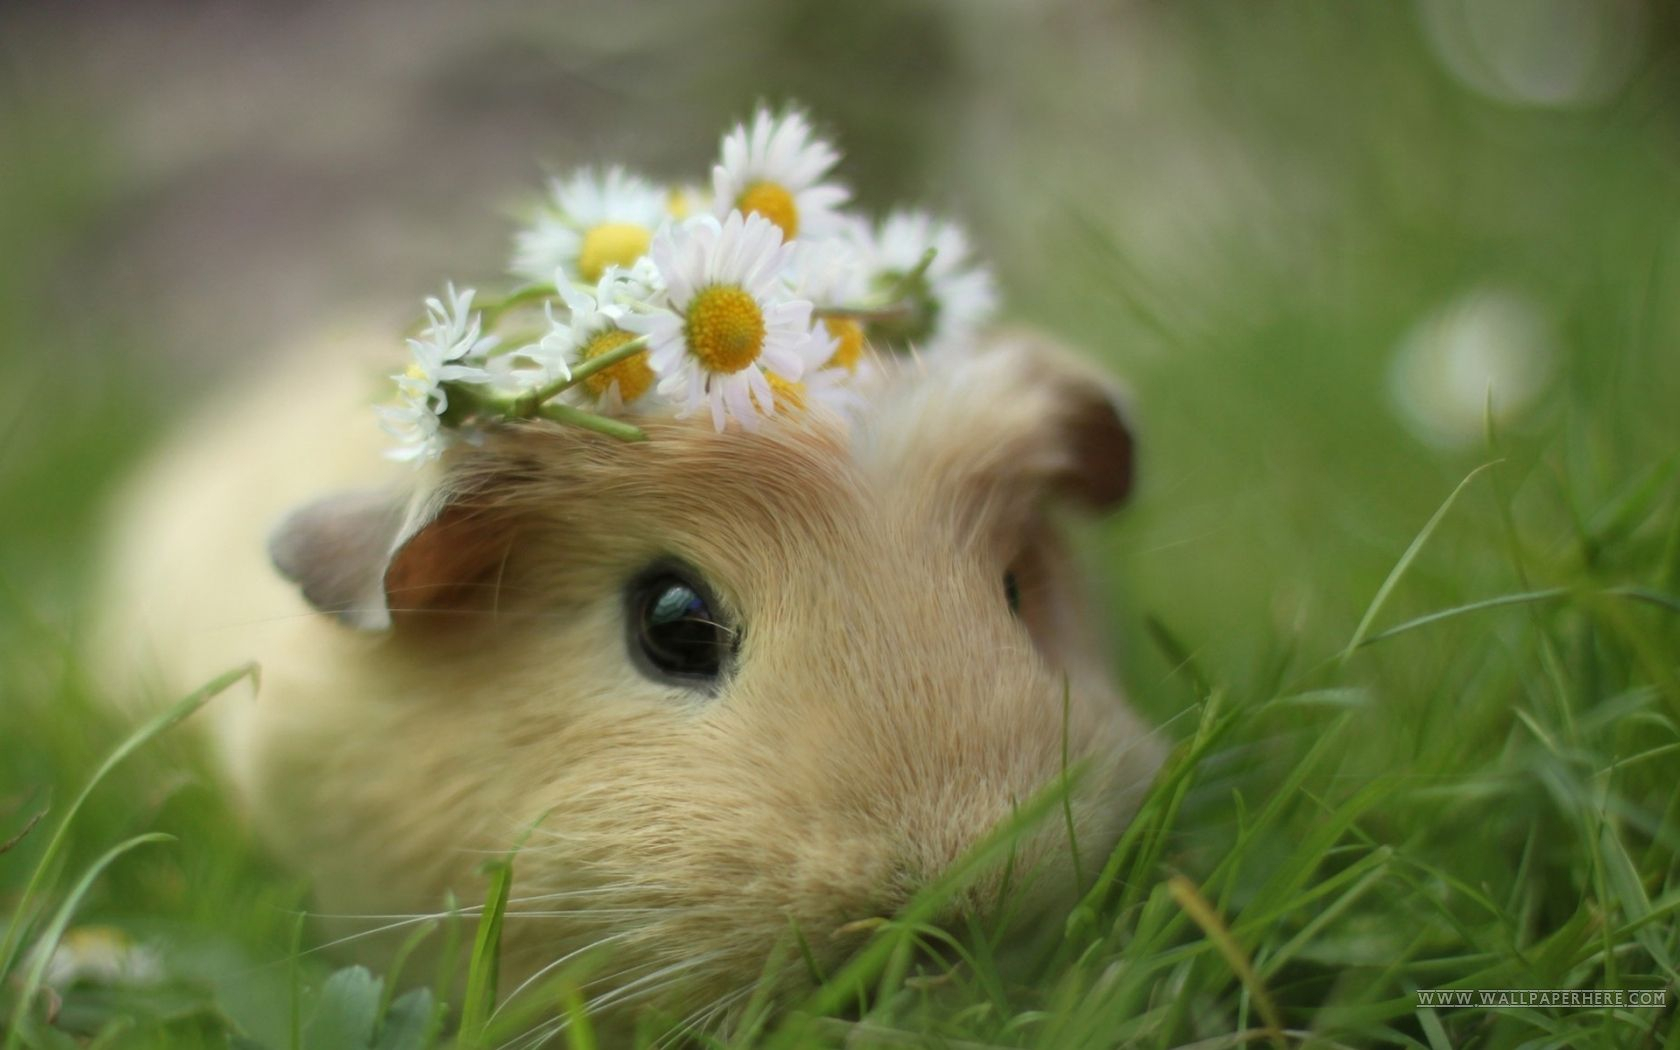 cute animal desktop wallpapers - top free cute animal desktop